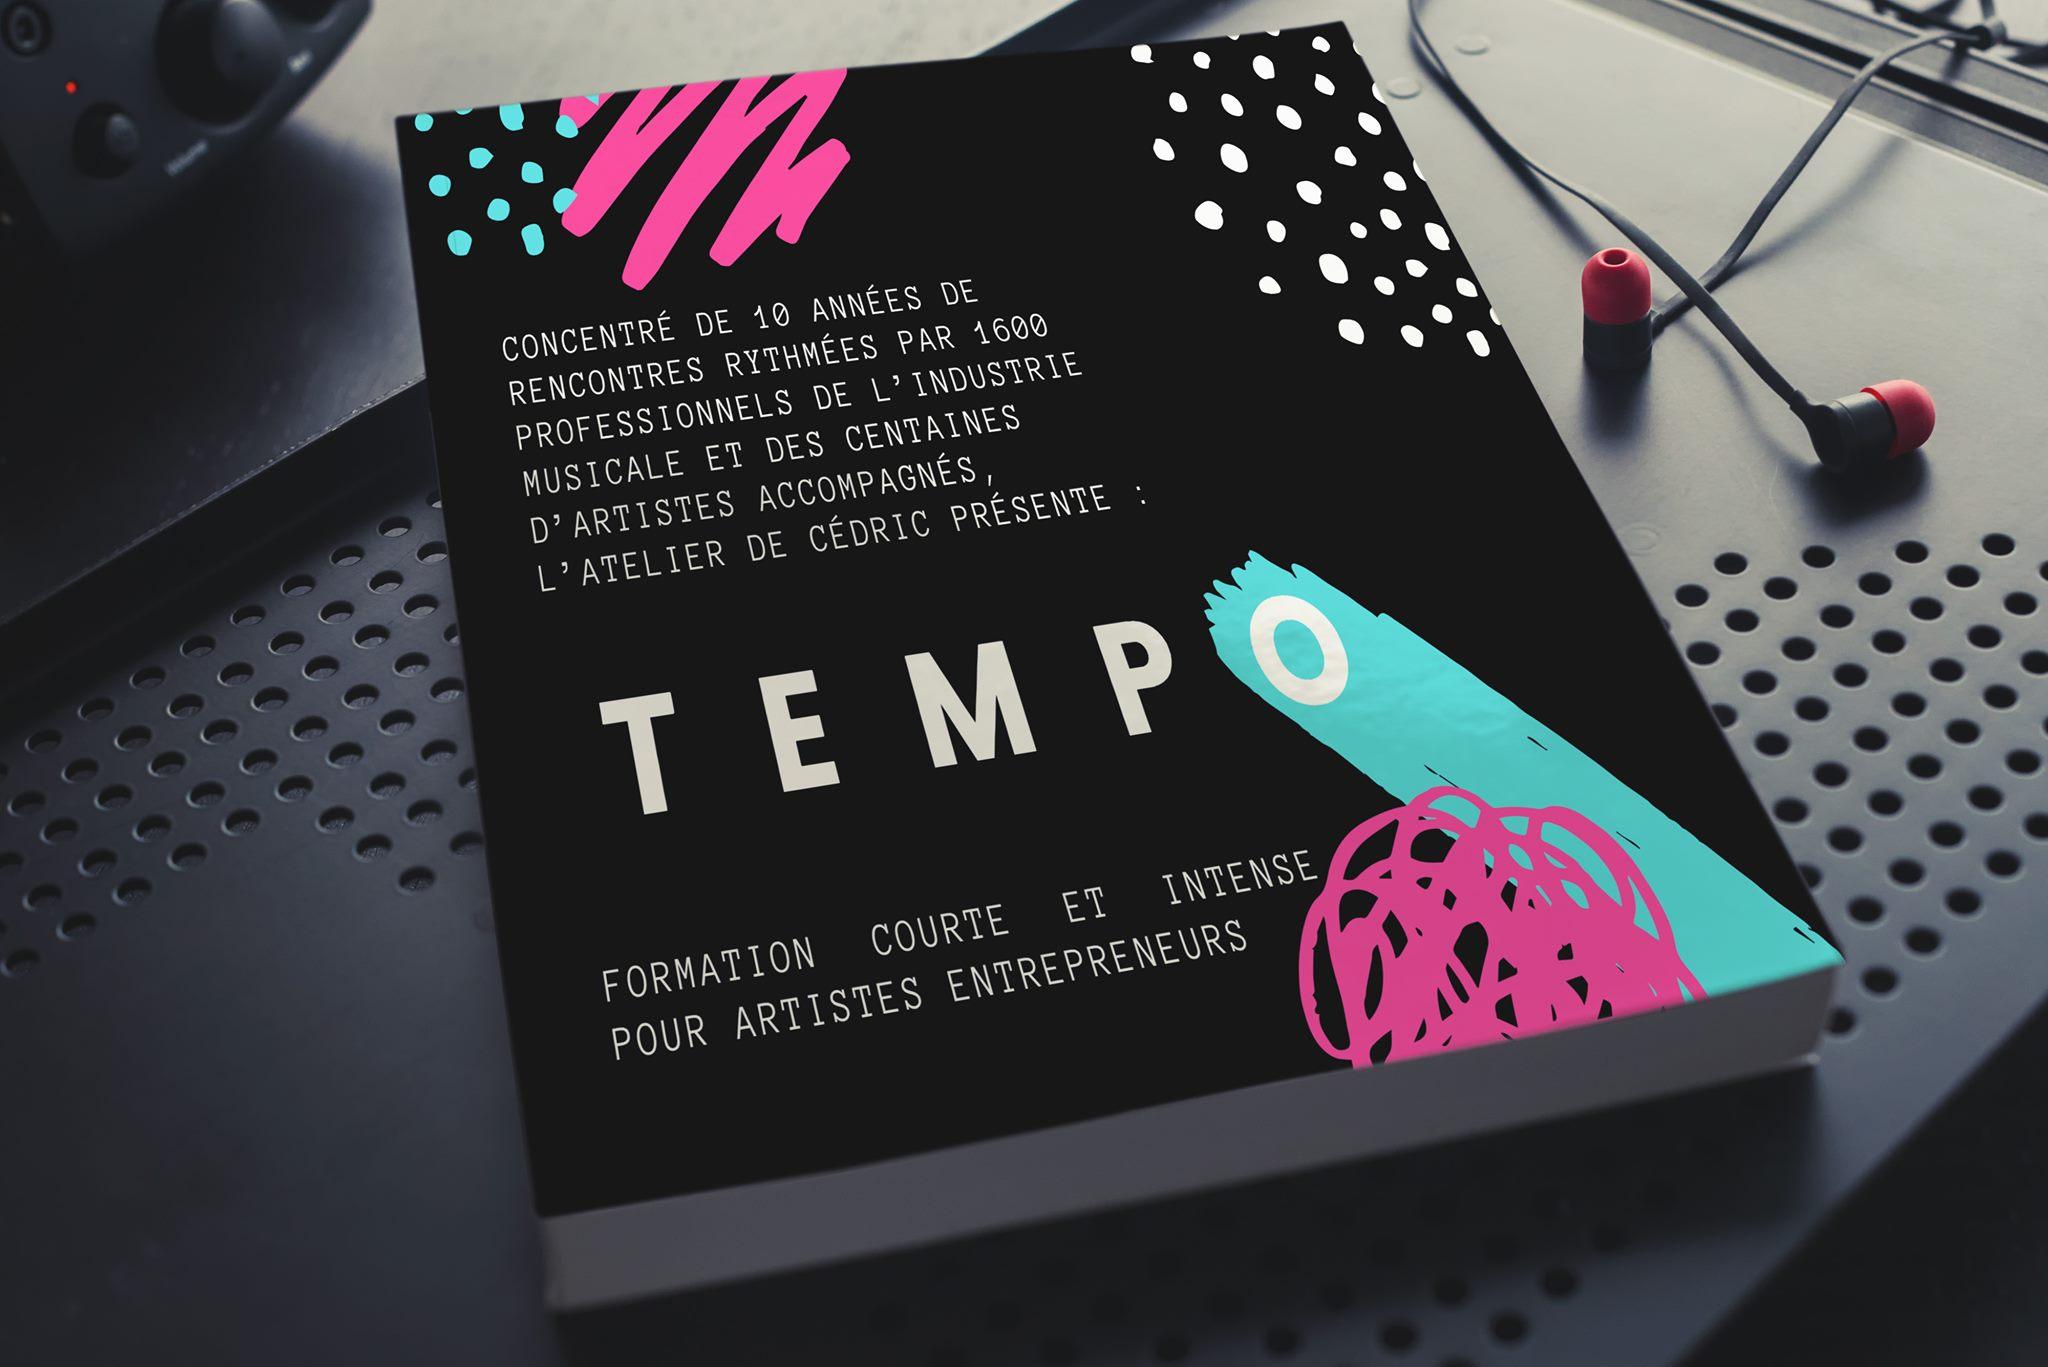 TEMPO - Formation pour Artistes entrepreneurs